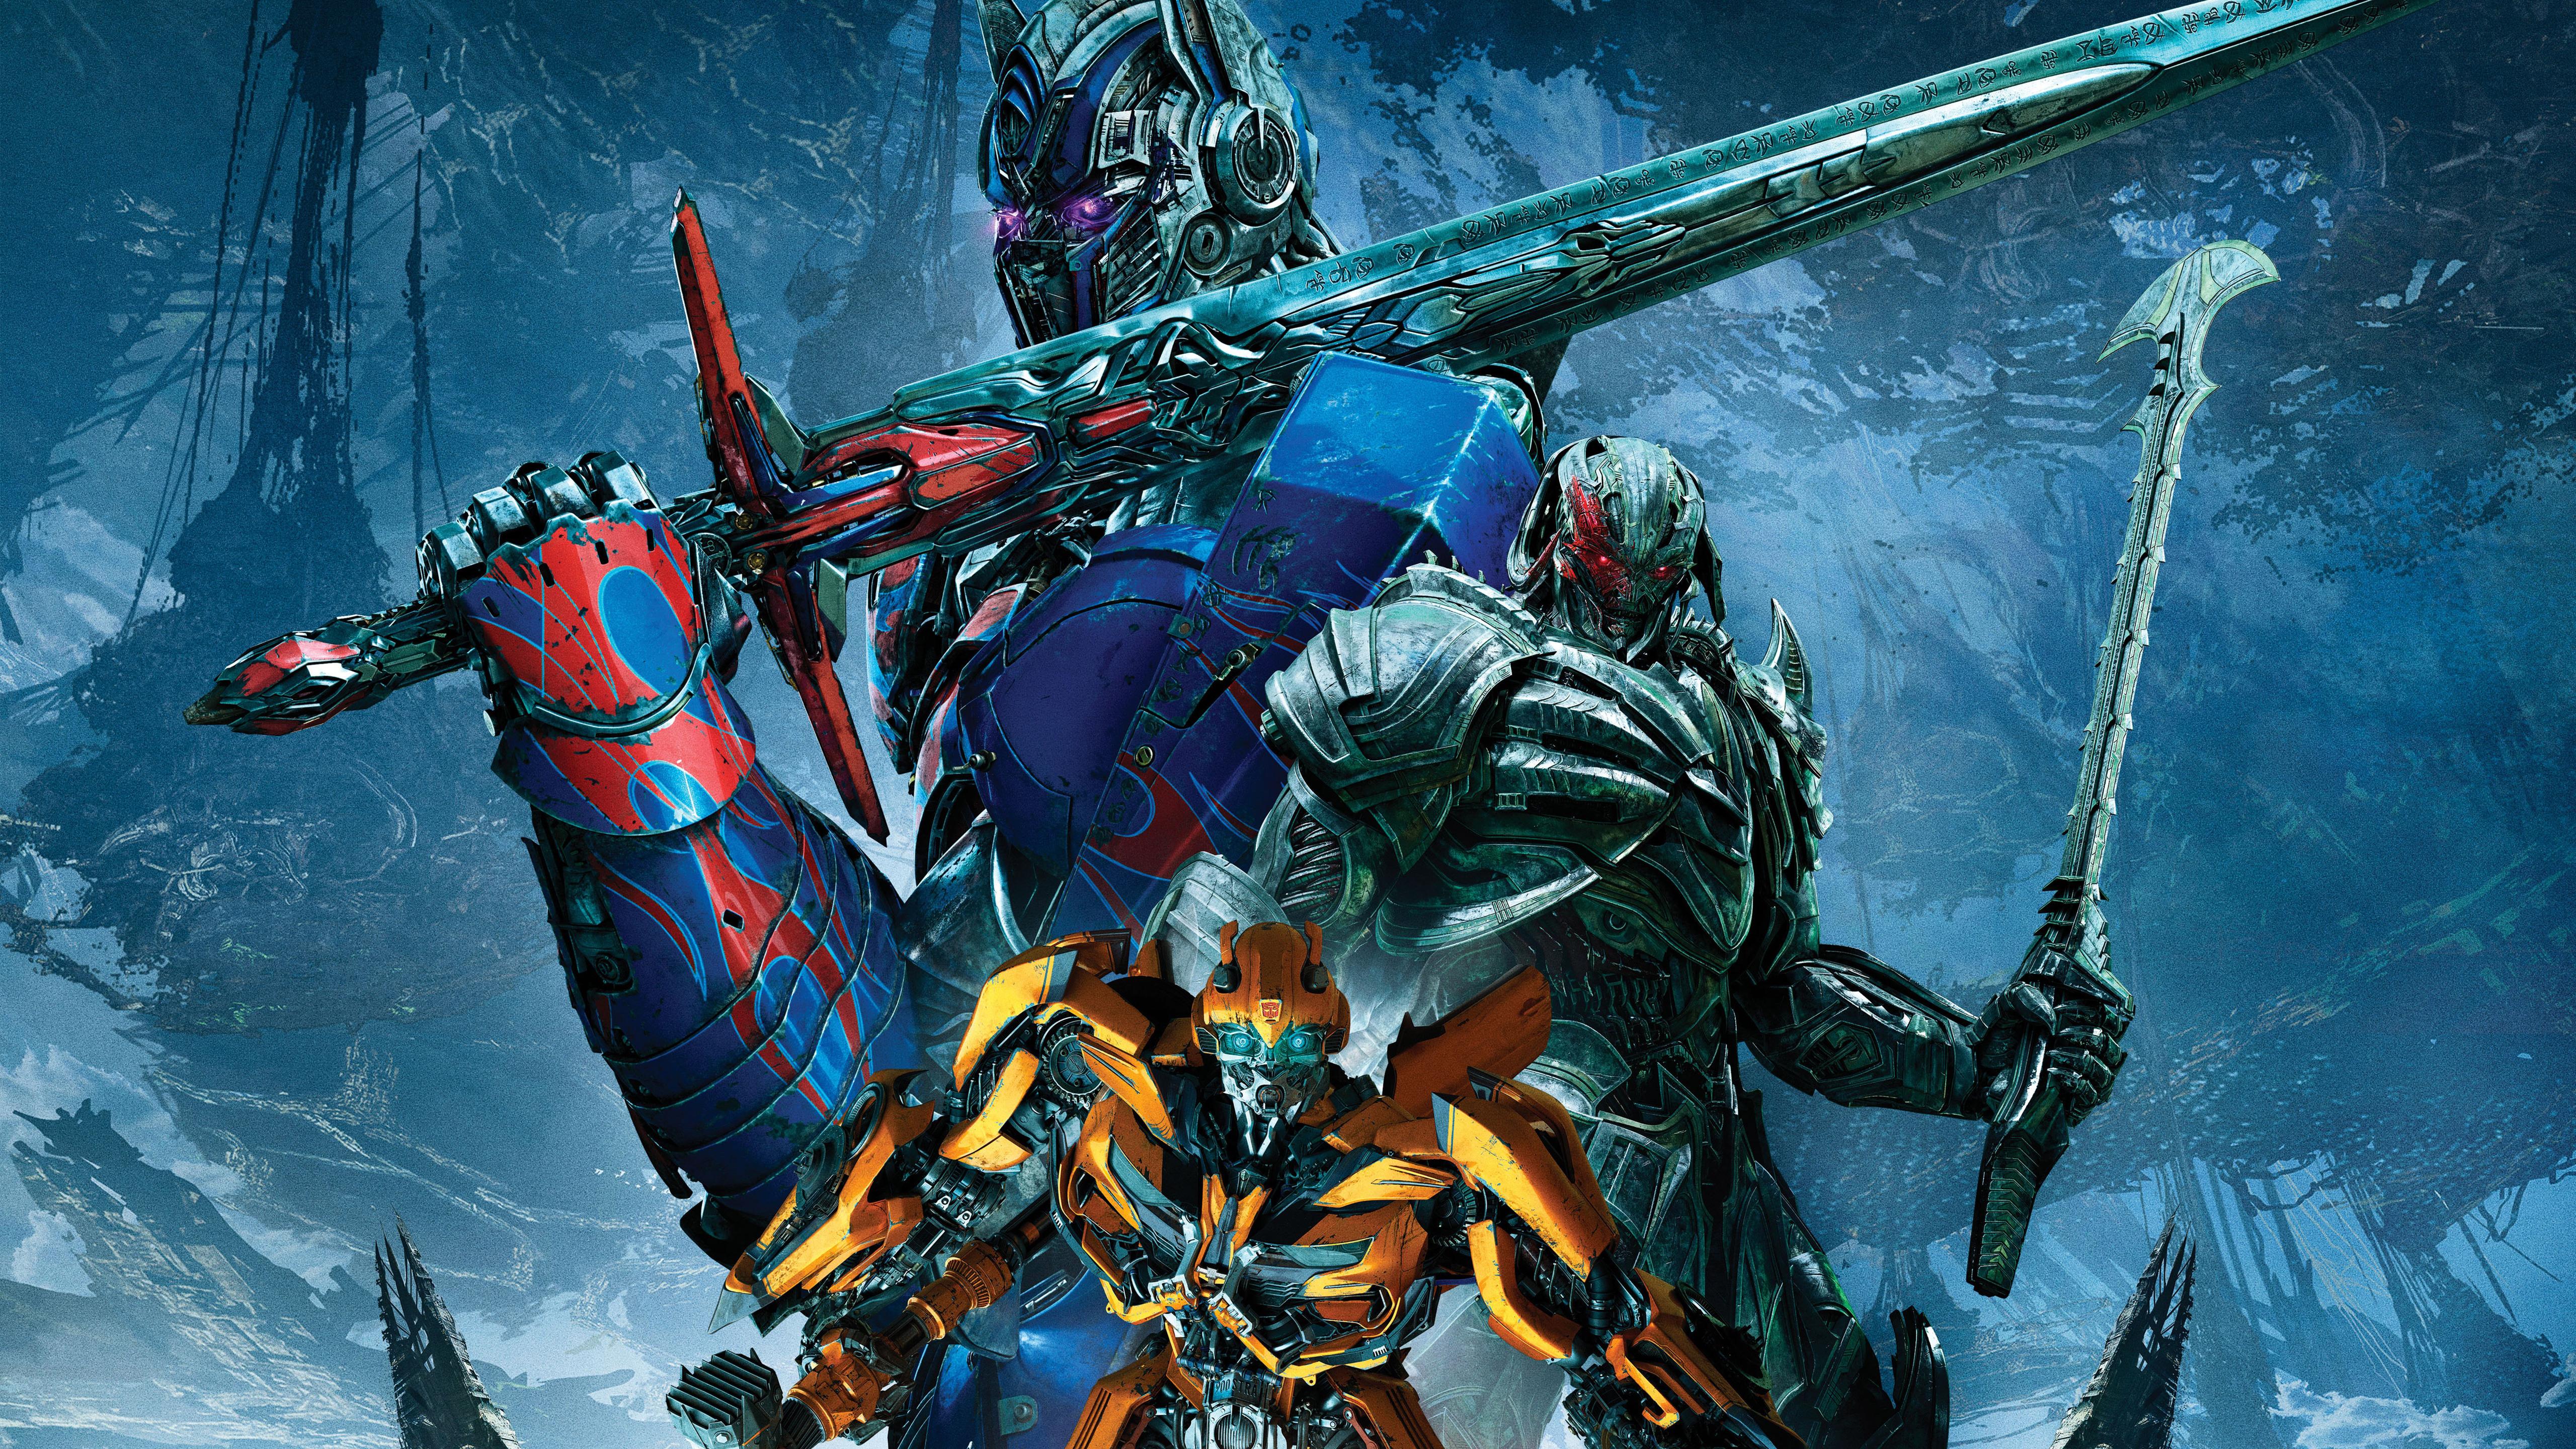 5120x2880 Transformers The Last Knight Bumblebee Megatron ...